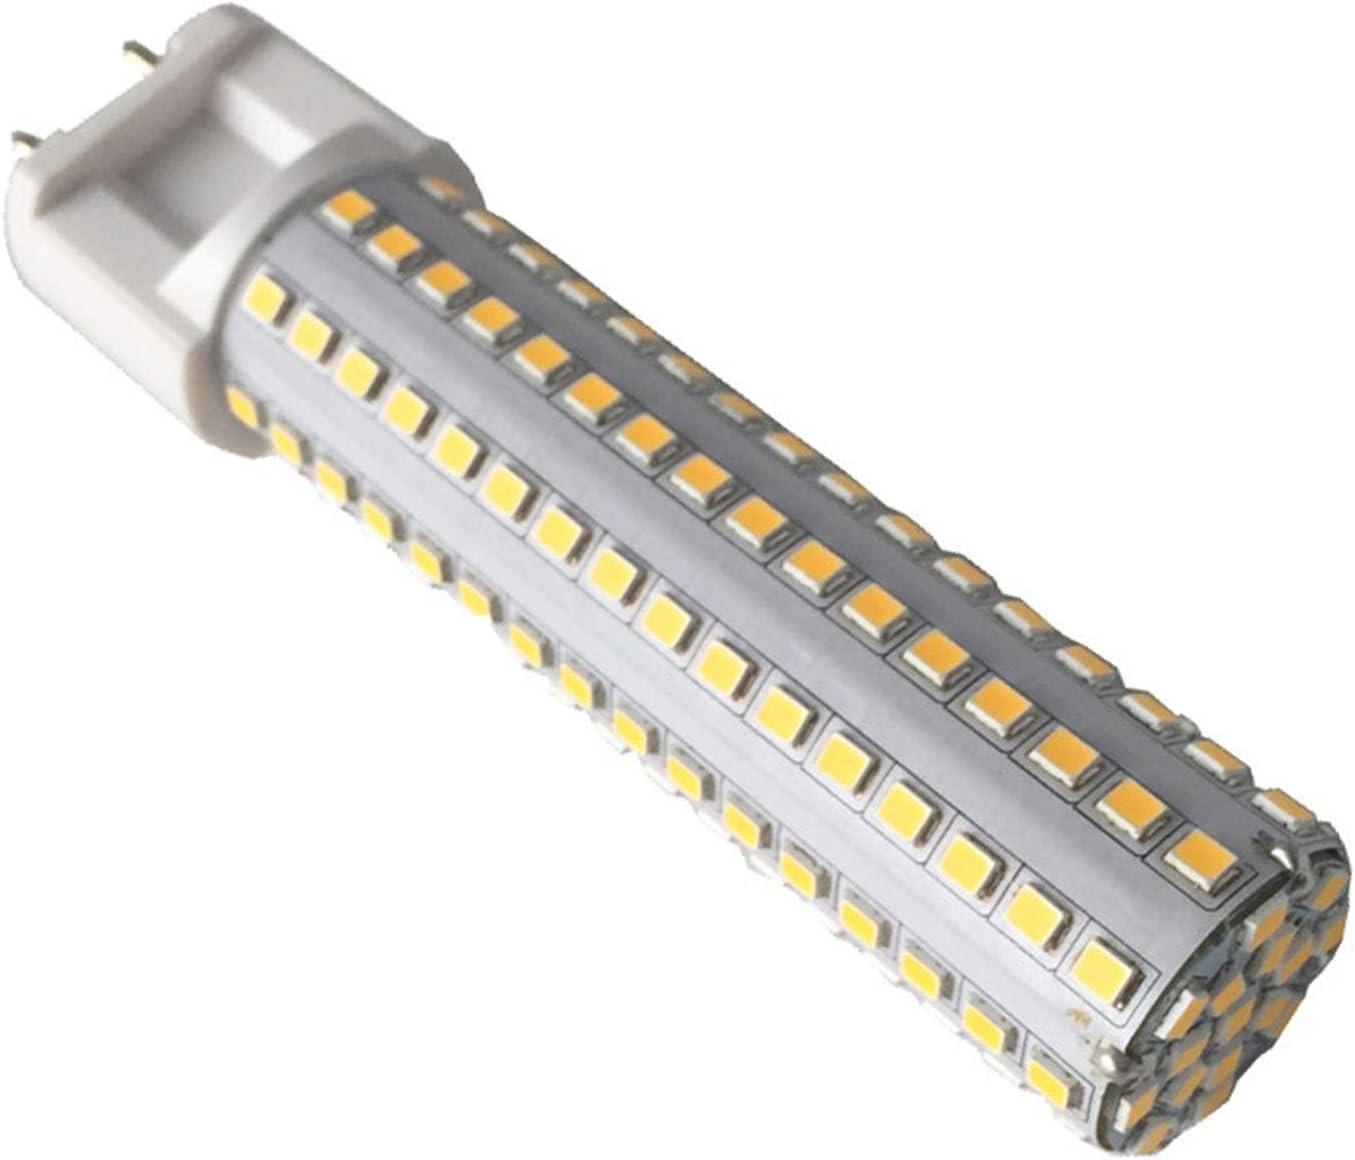 YEZIQ Led Corn Light Bulbs Cheap mail order shopping LED 120W Altern 15W Halogen G12 Max 79% OFF